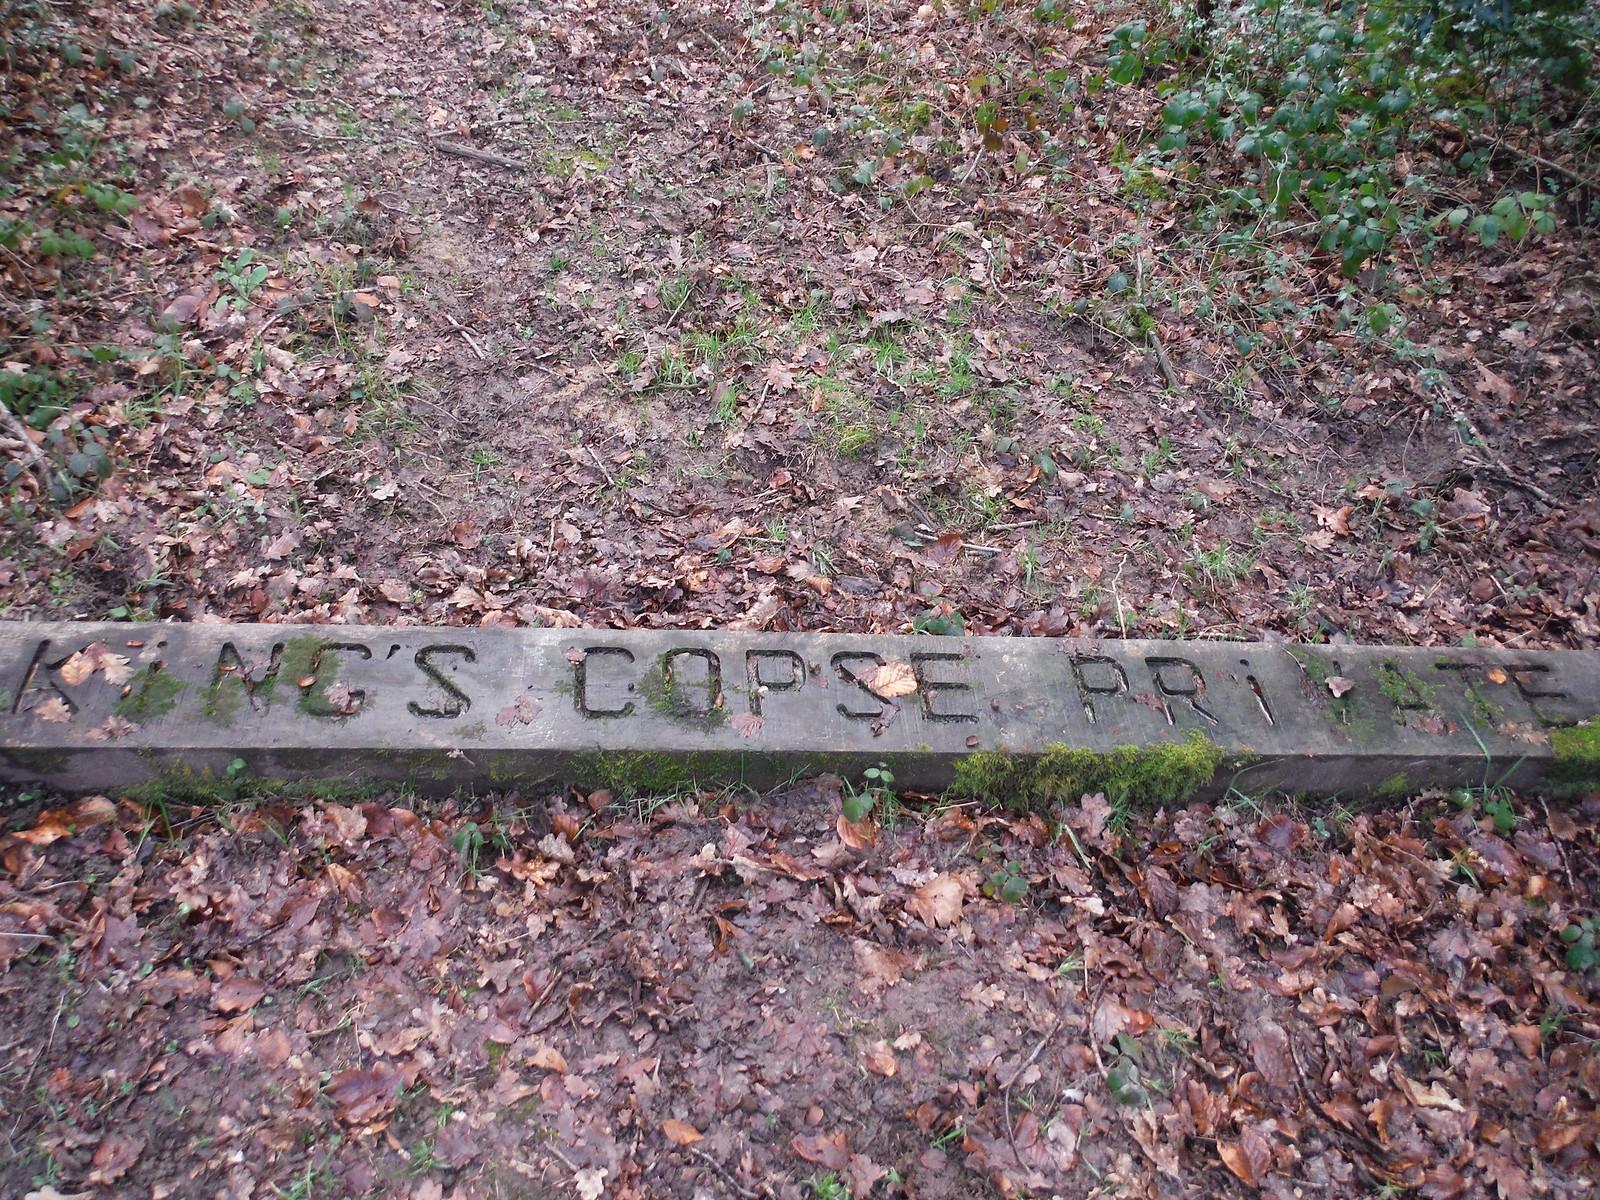 King's Copse waymarker, Stanford Dingley SWC Walk 117 Aldermaston to Woolhampton (via Stanford Dingley)